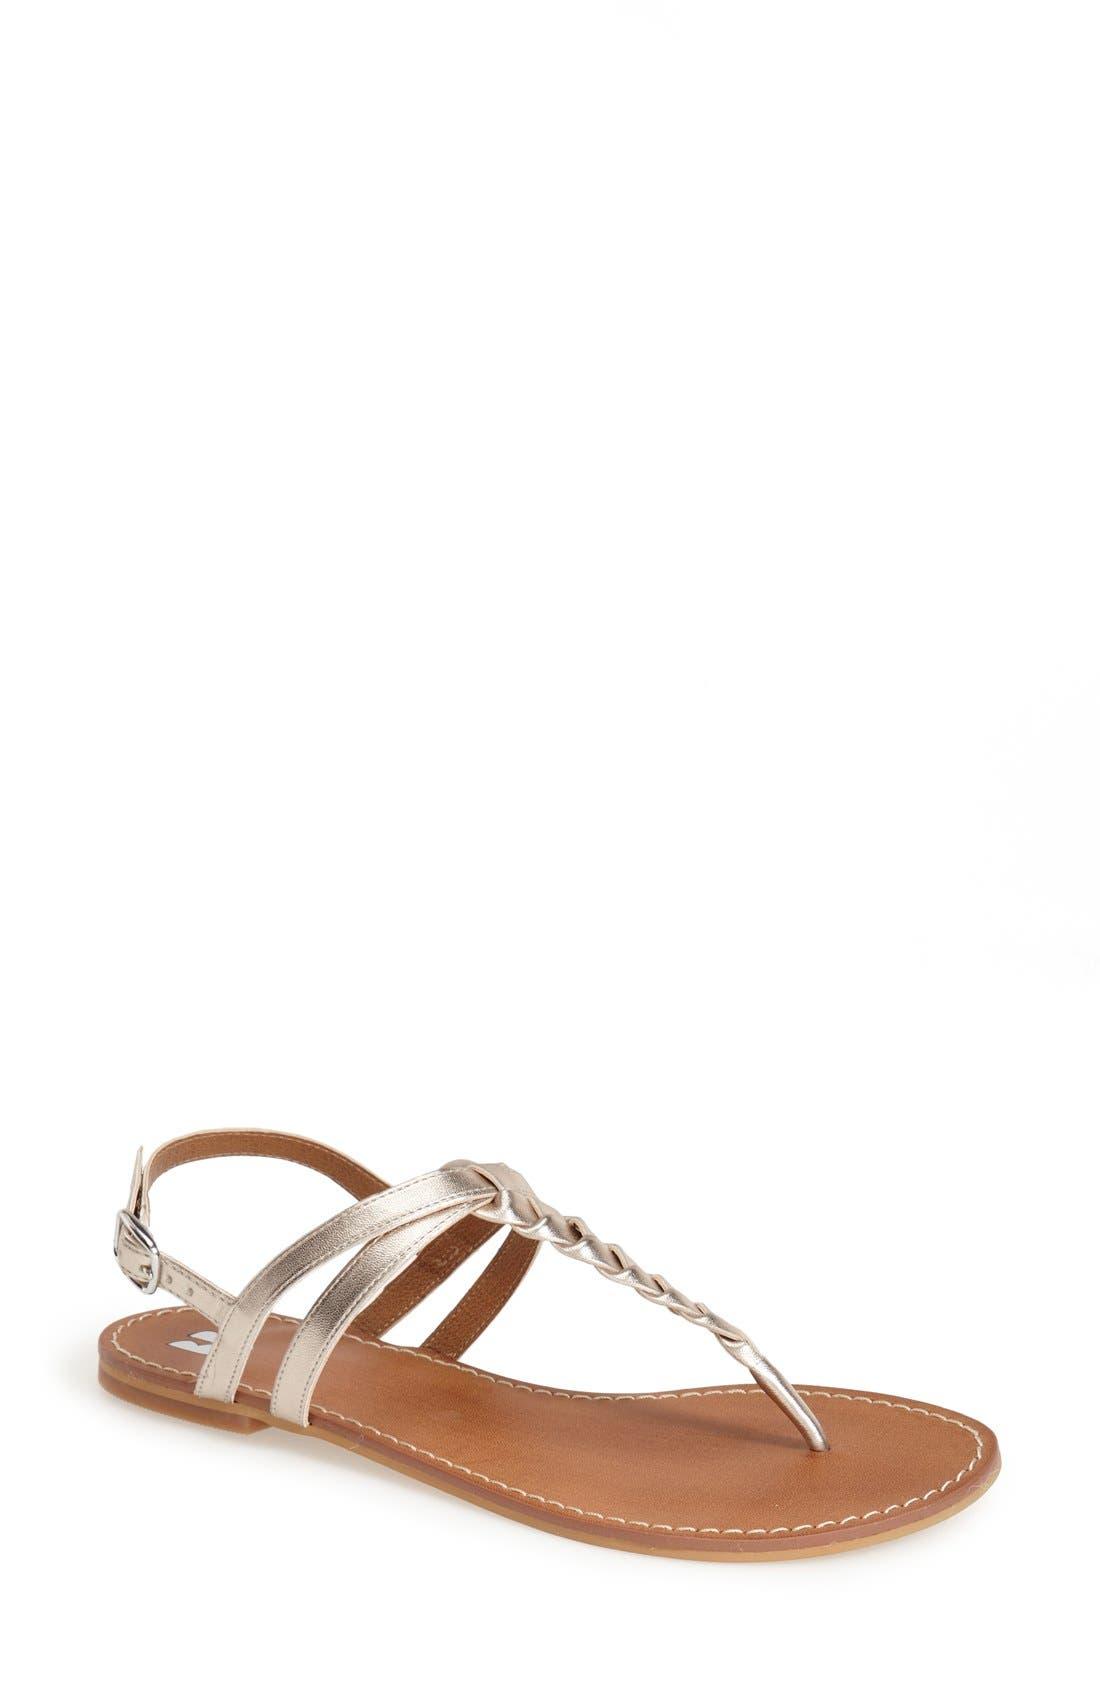 Alternate Image 1 Selected - BP. 'Surf' Flat Sandal (Women)